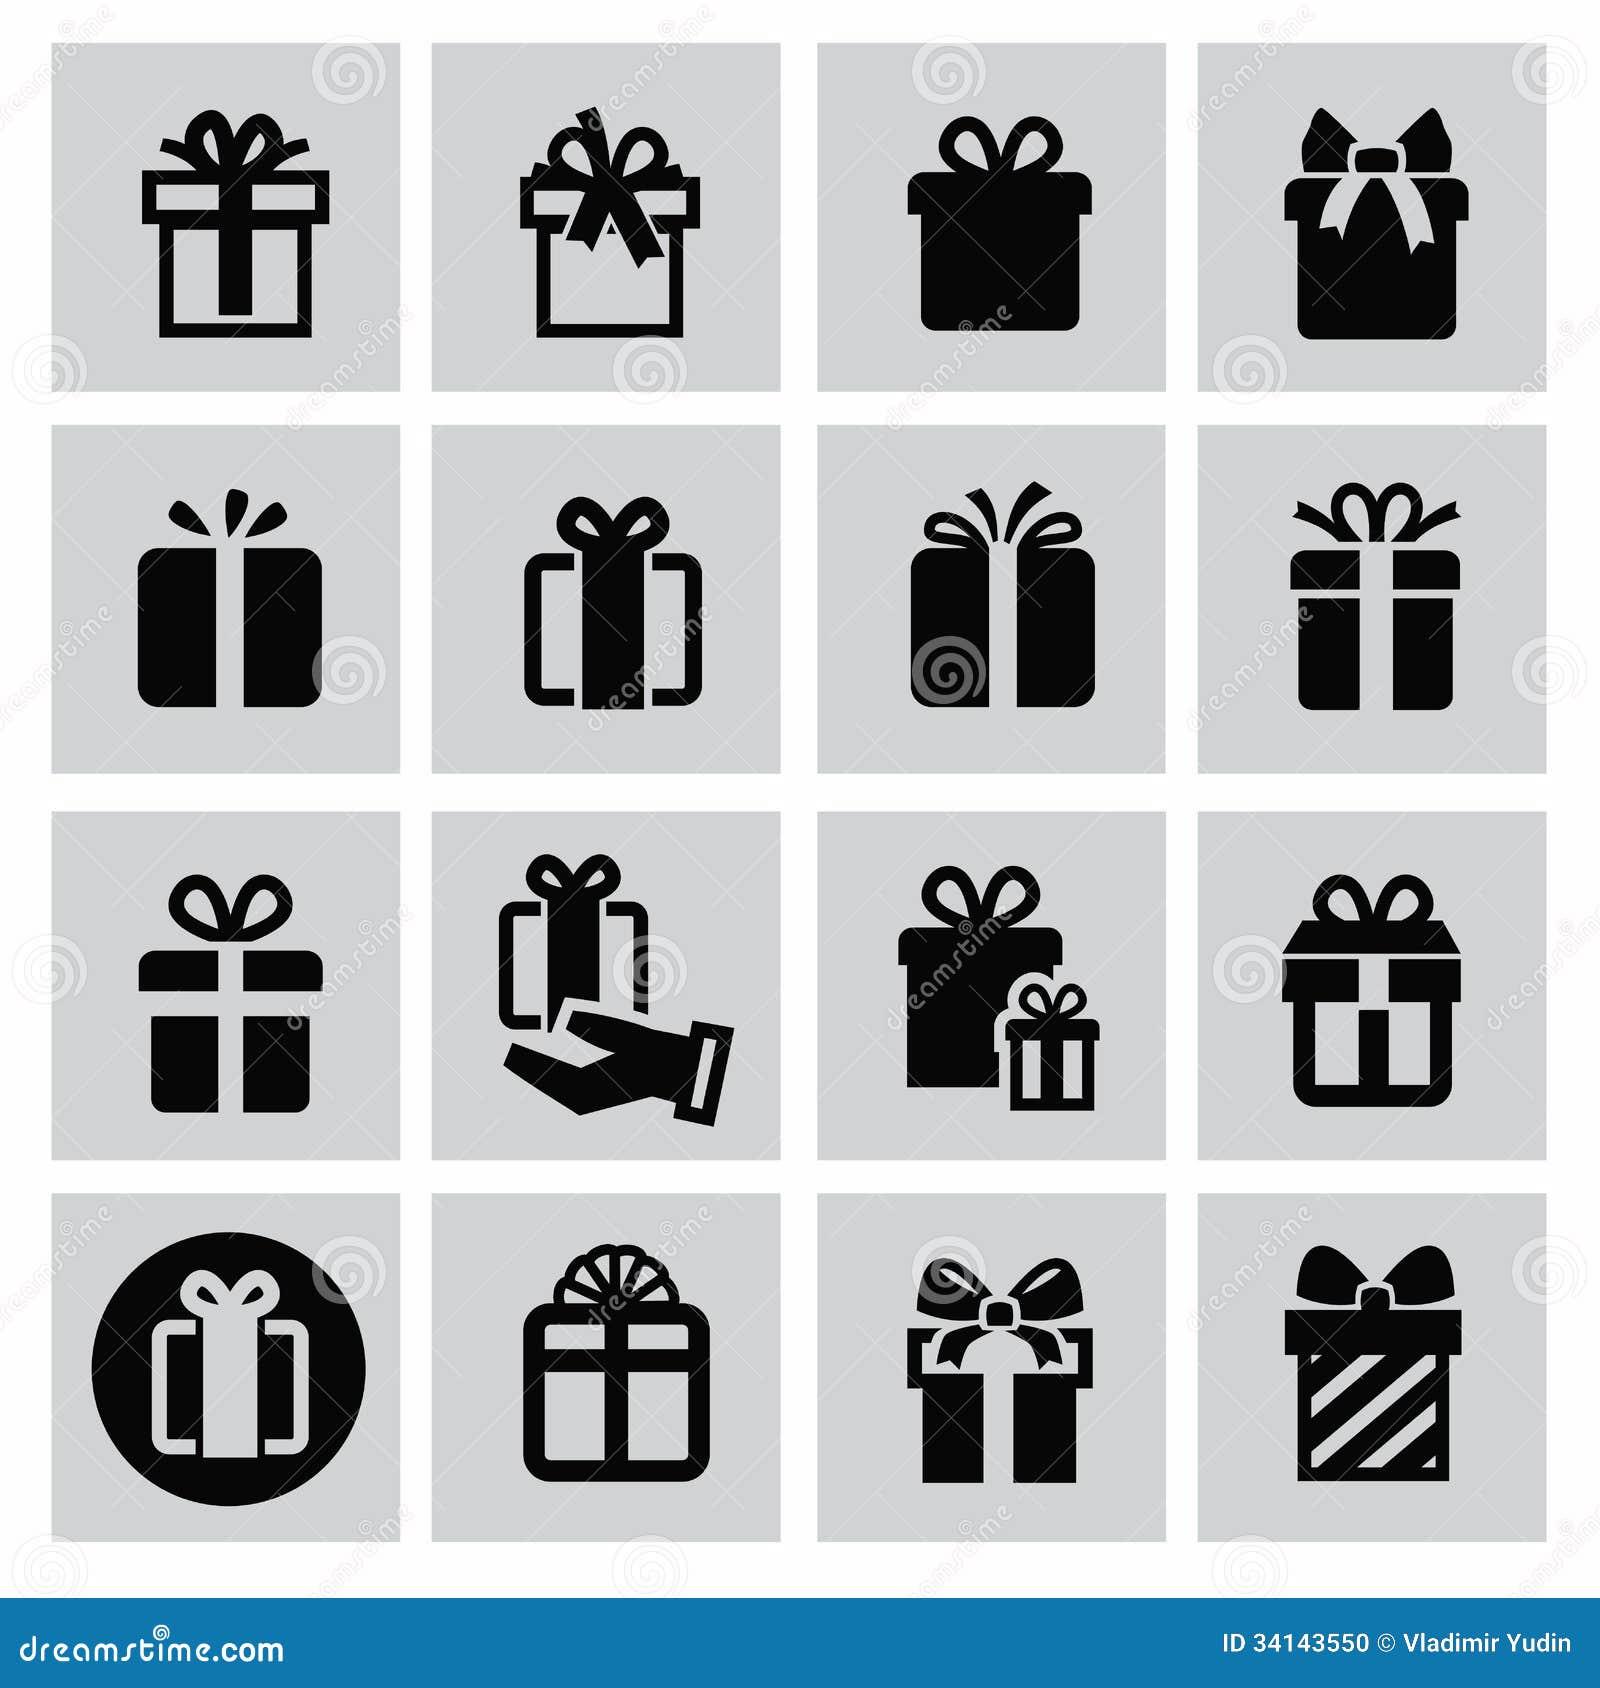 Gift icons stock vector. Illustration of gift, sacrifice ...